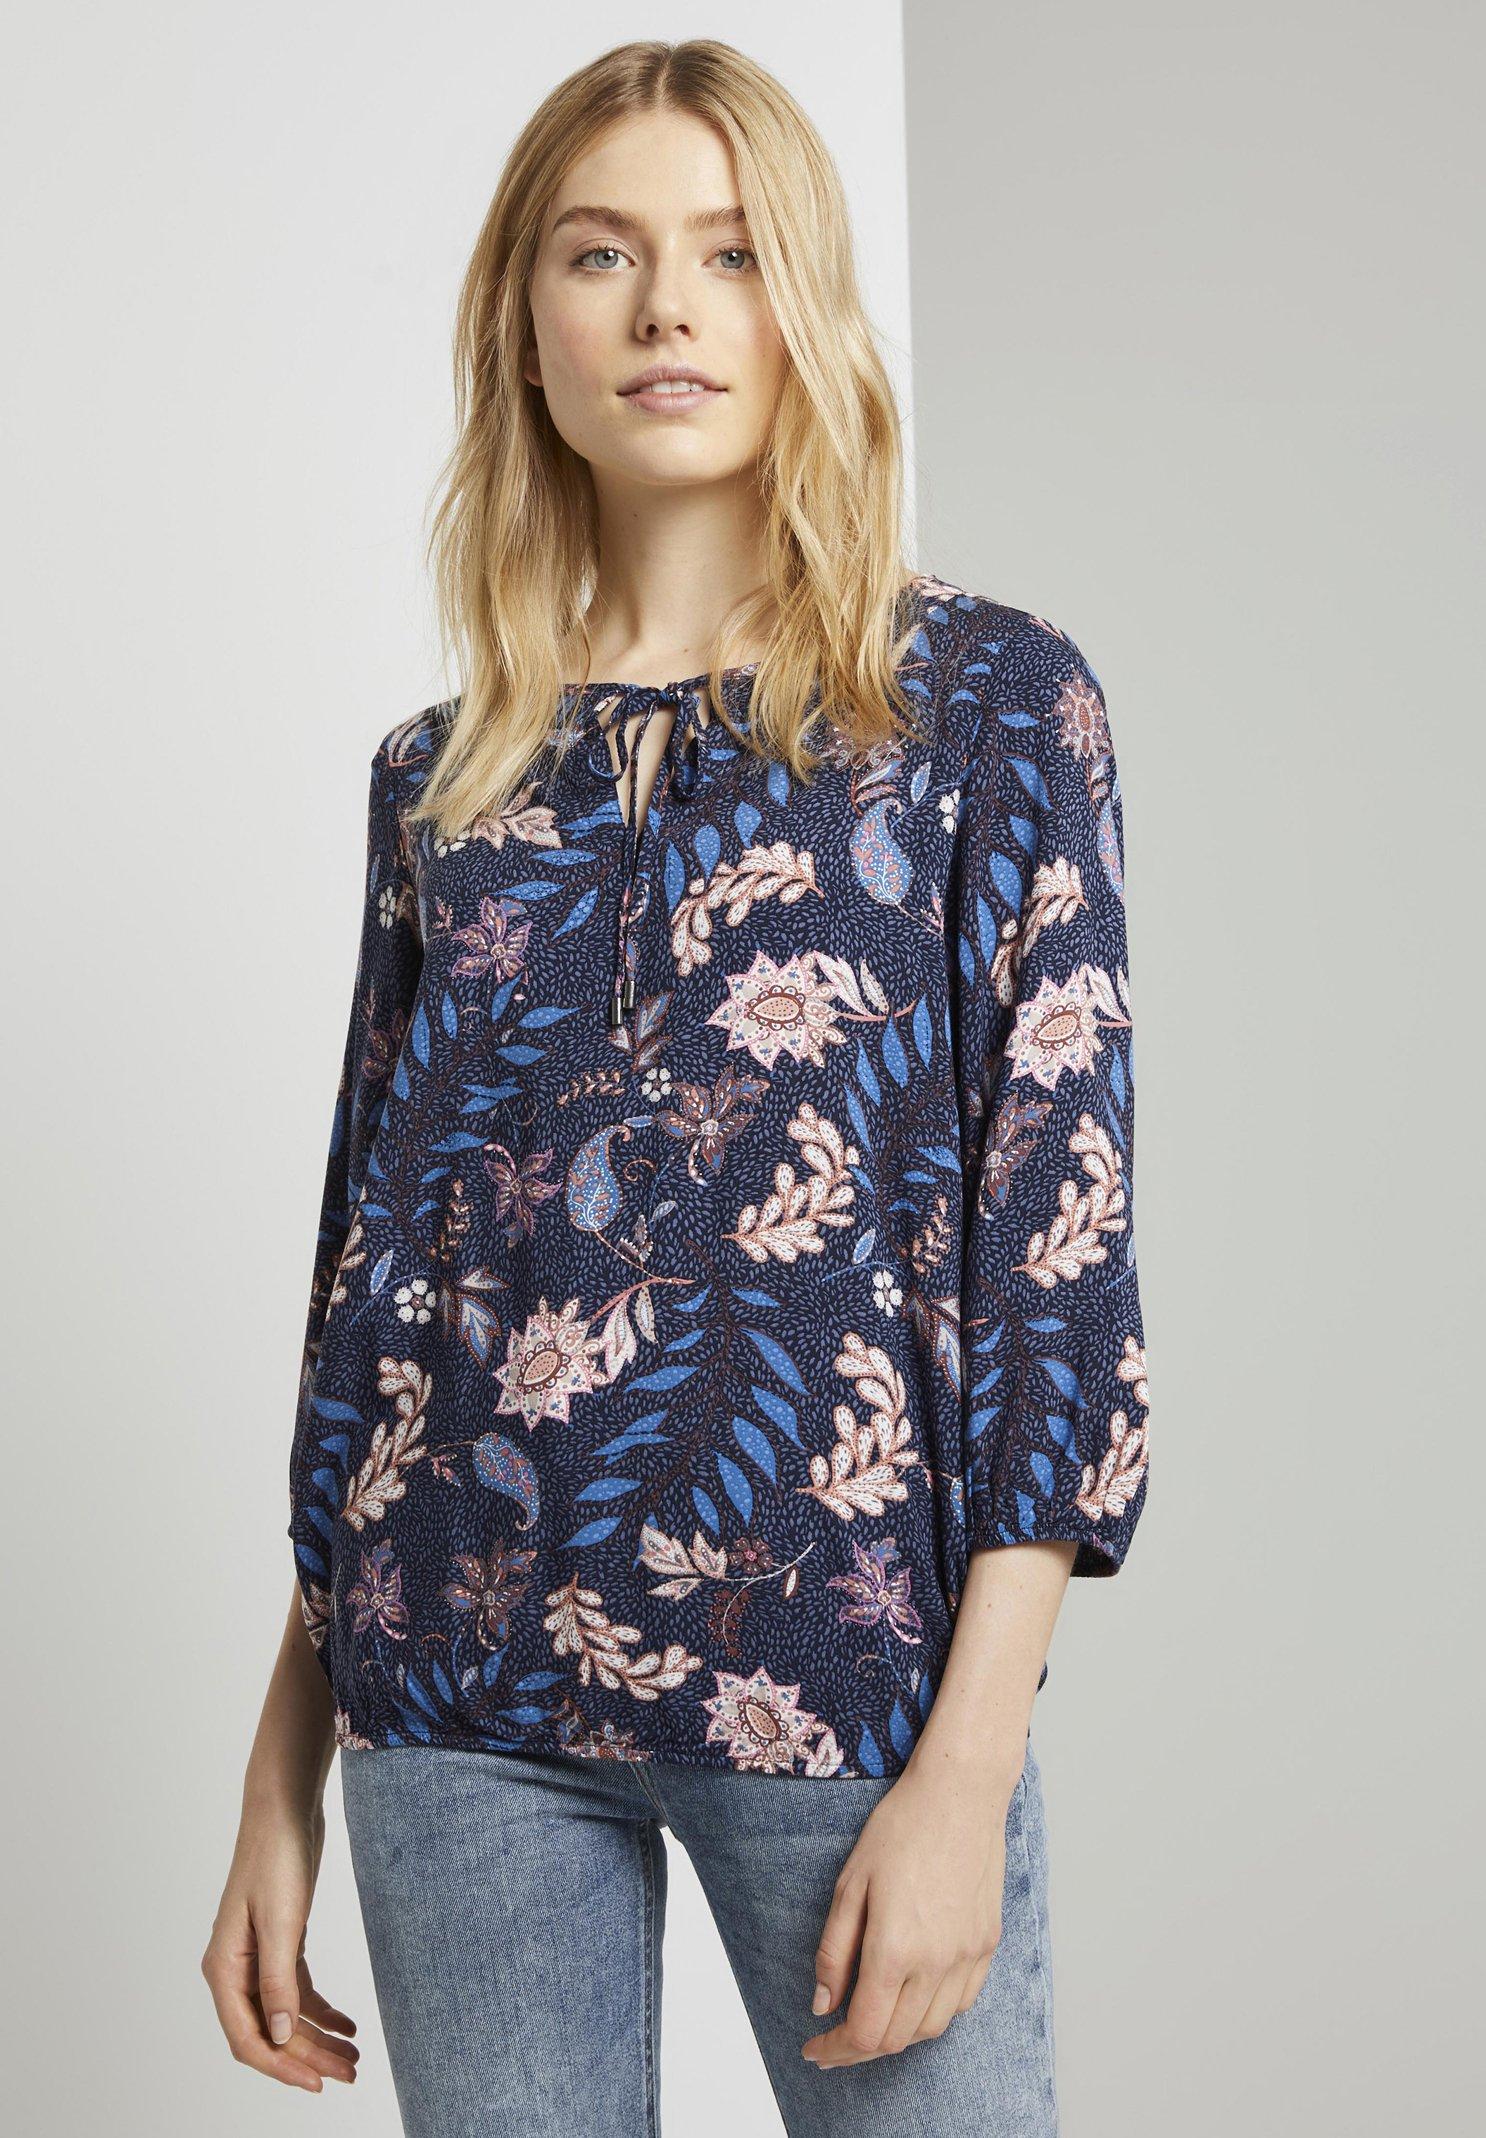 TOM TAILOR Blouse - navy floral design - Dameskleding Oprecht